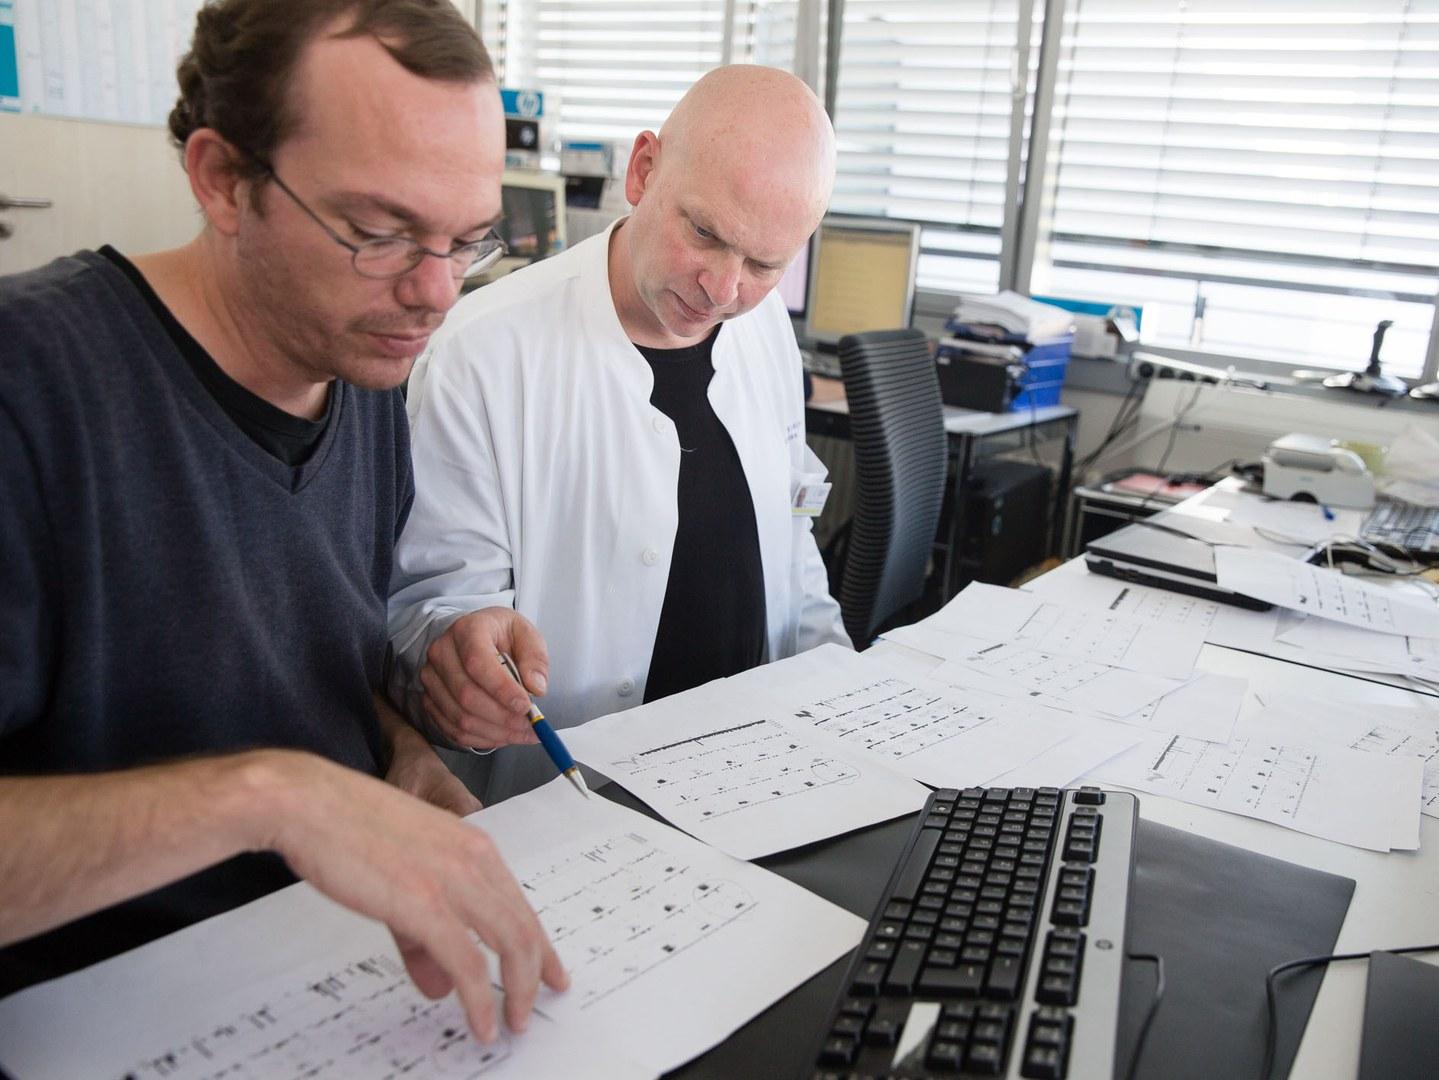 Dr. Thomas Reber (left) and Prof. Dr. Dr. Florian Mormann